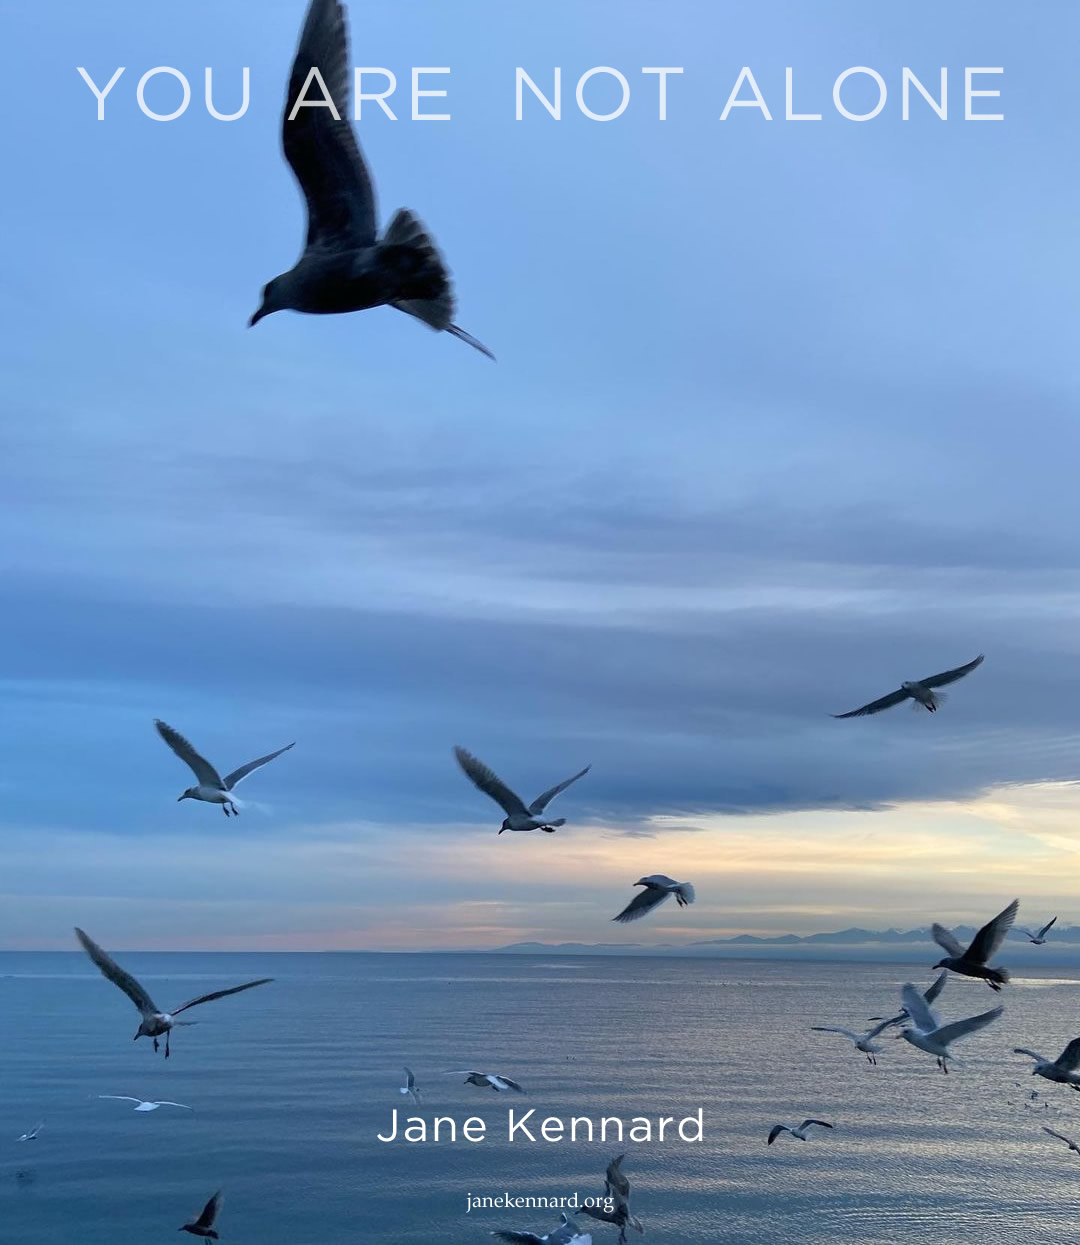 jane-kennard-you-are-not-alone-photo-kirsten-pierce